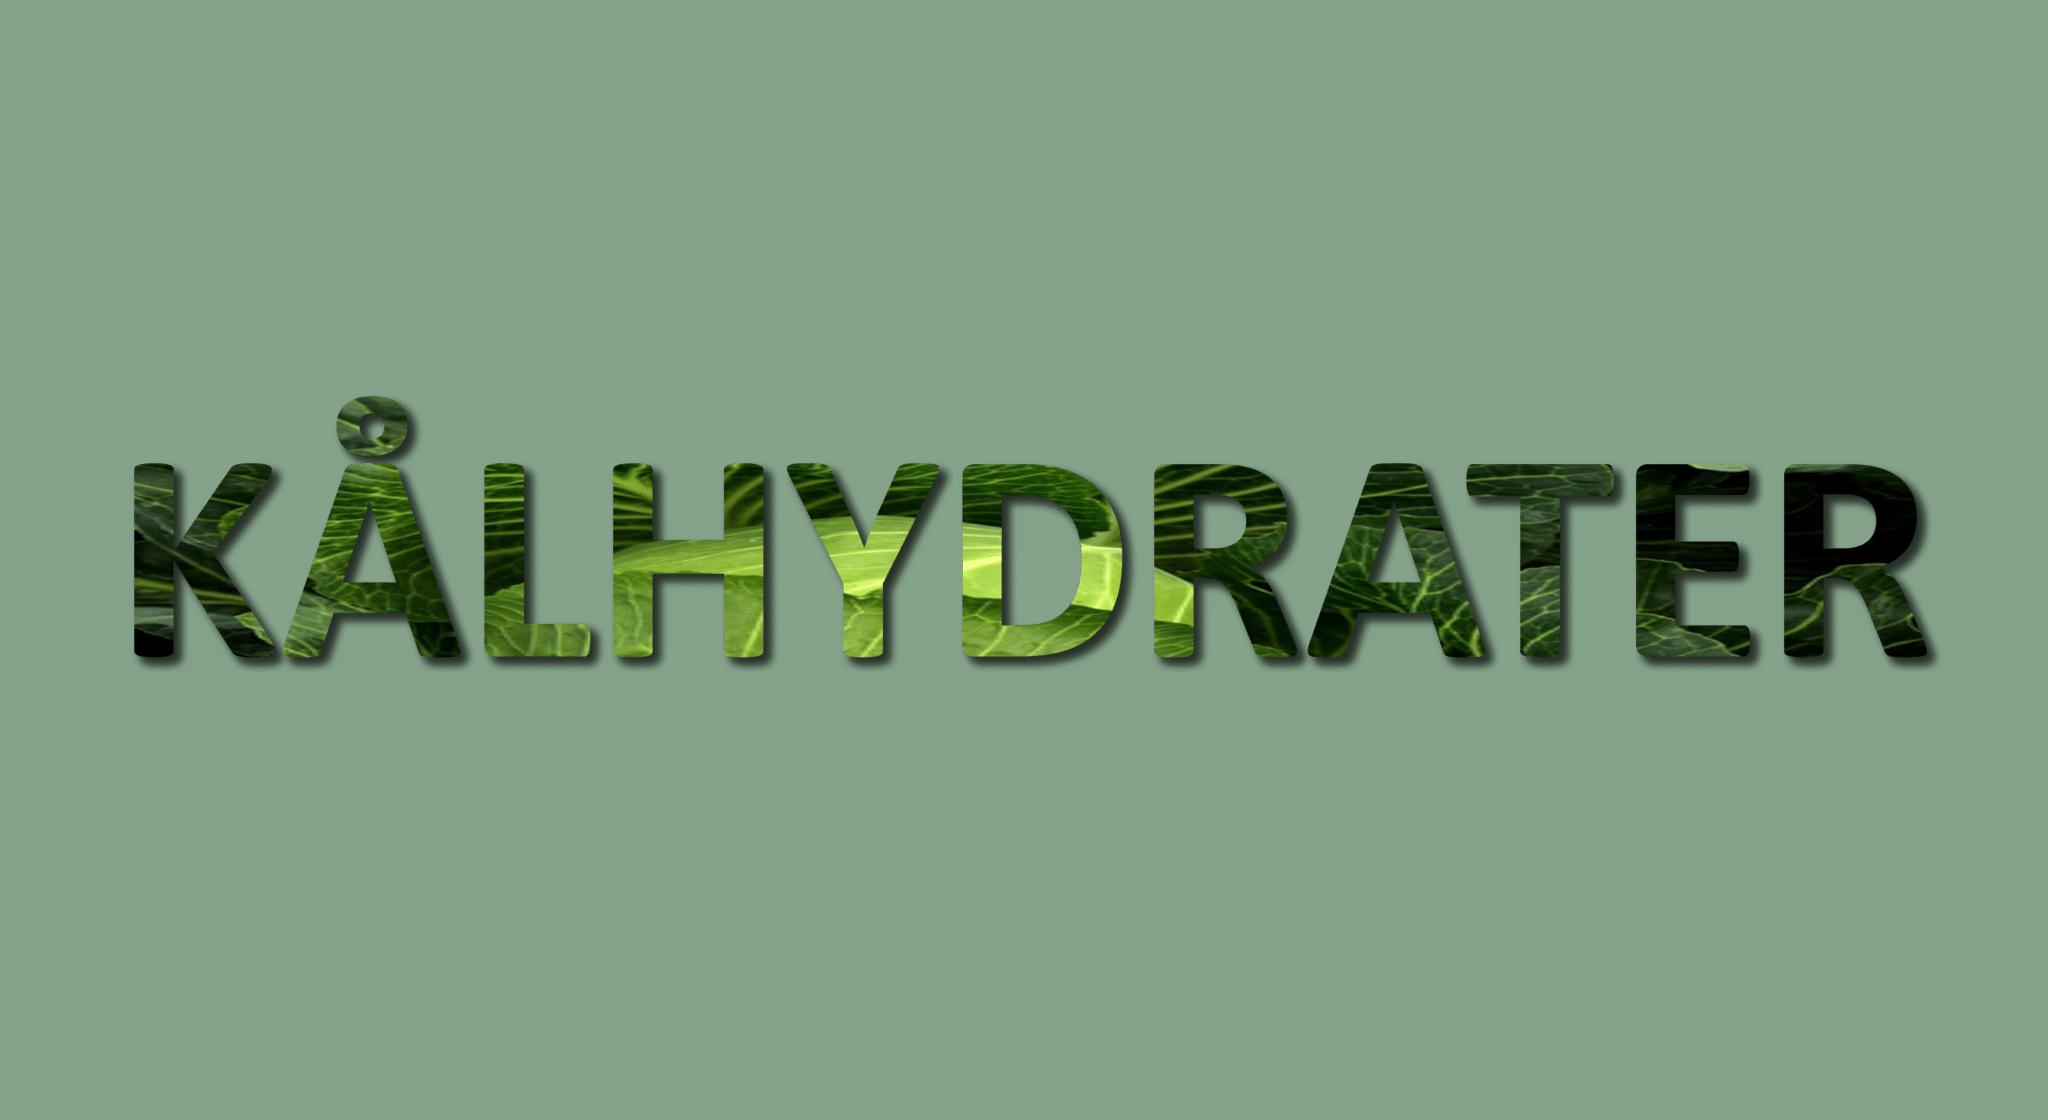 Kålhydrater